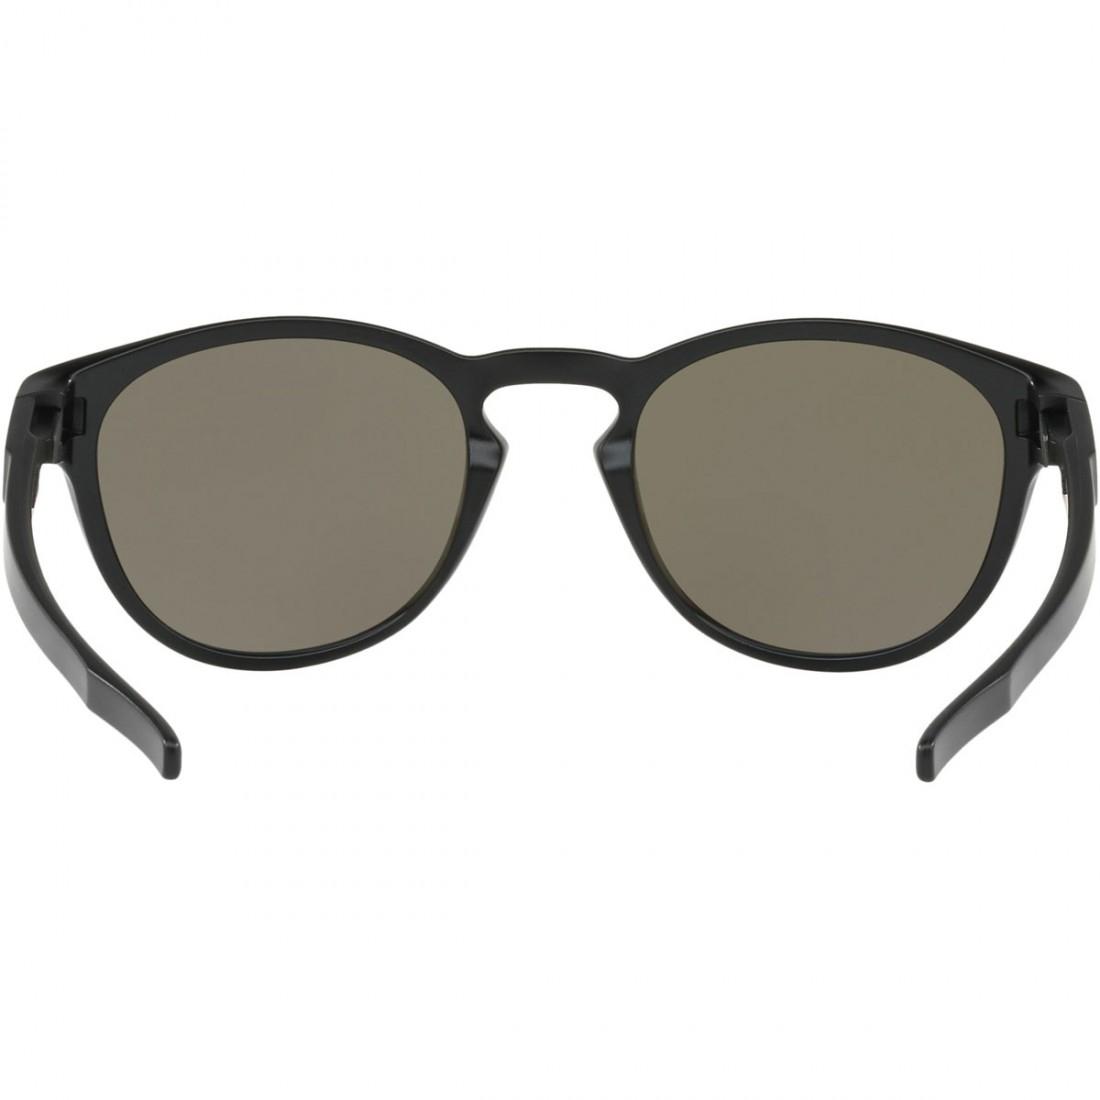 0bcabcf596 Gafas de sol OAKLEY Latch Matte Black / Prizm Jade · Motocard